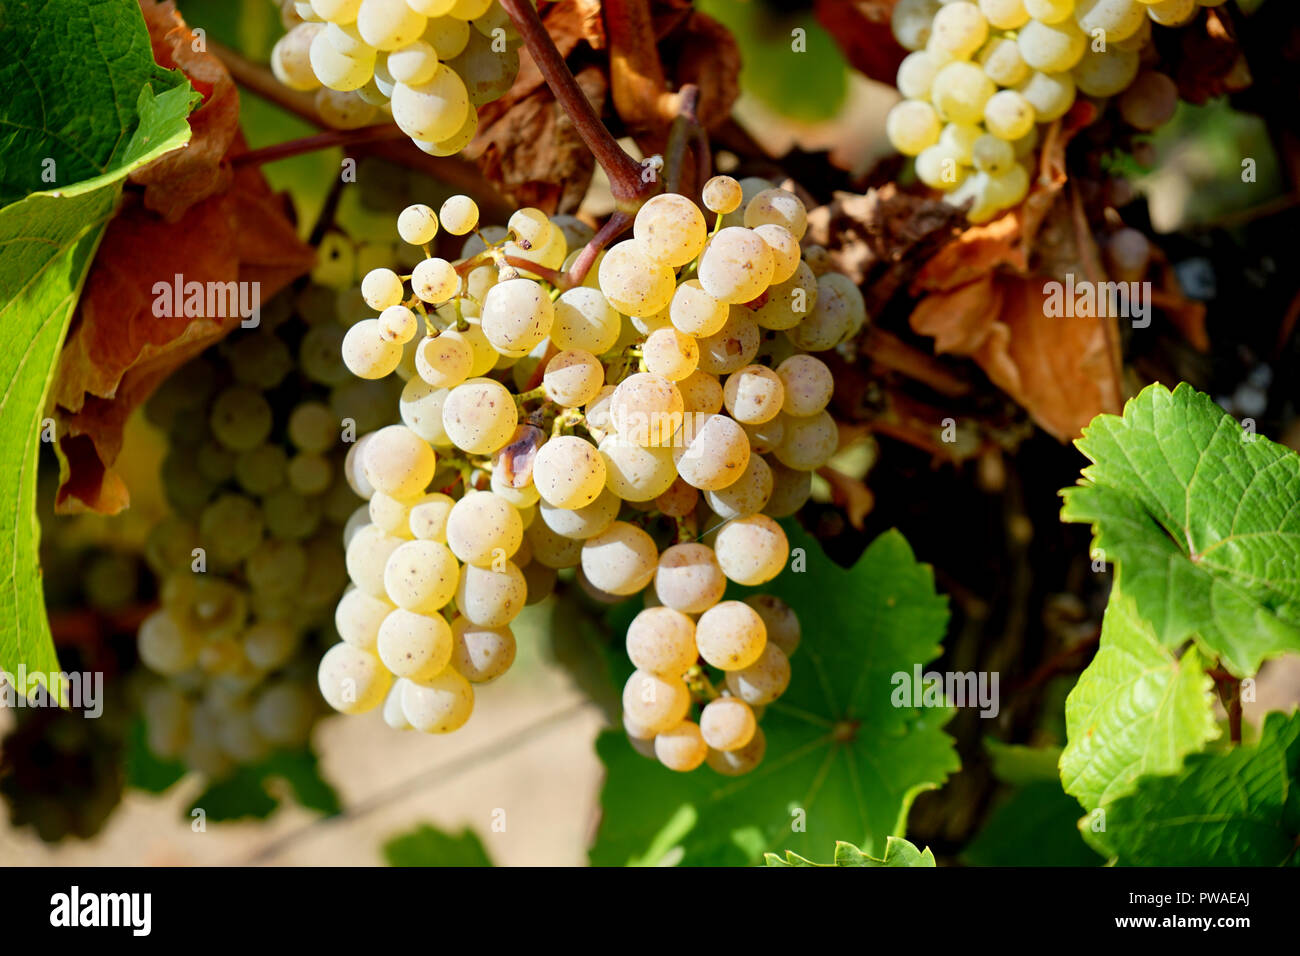 Rieslingtrauben, Edle Weinrebe (Vitis vinifera Subsp vinifera), Moseltal, Deutschland, Europa Stockbild